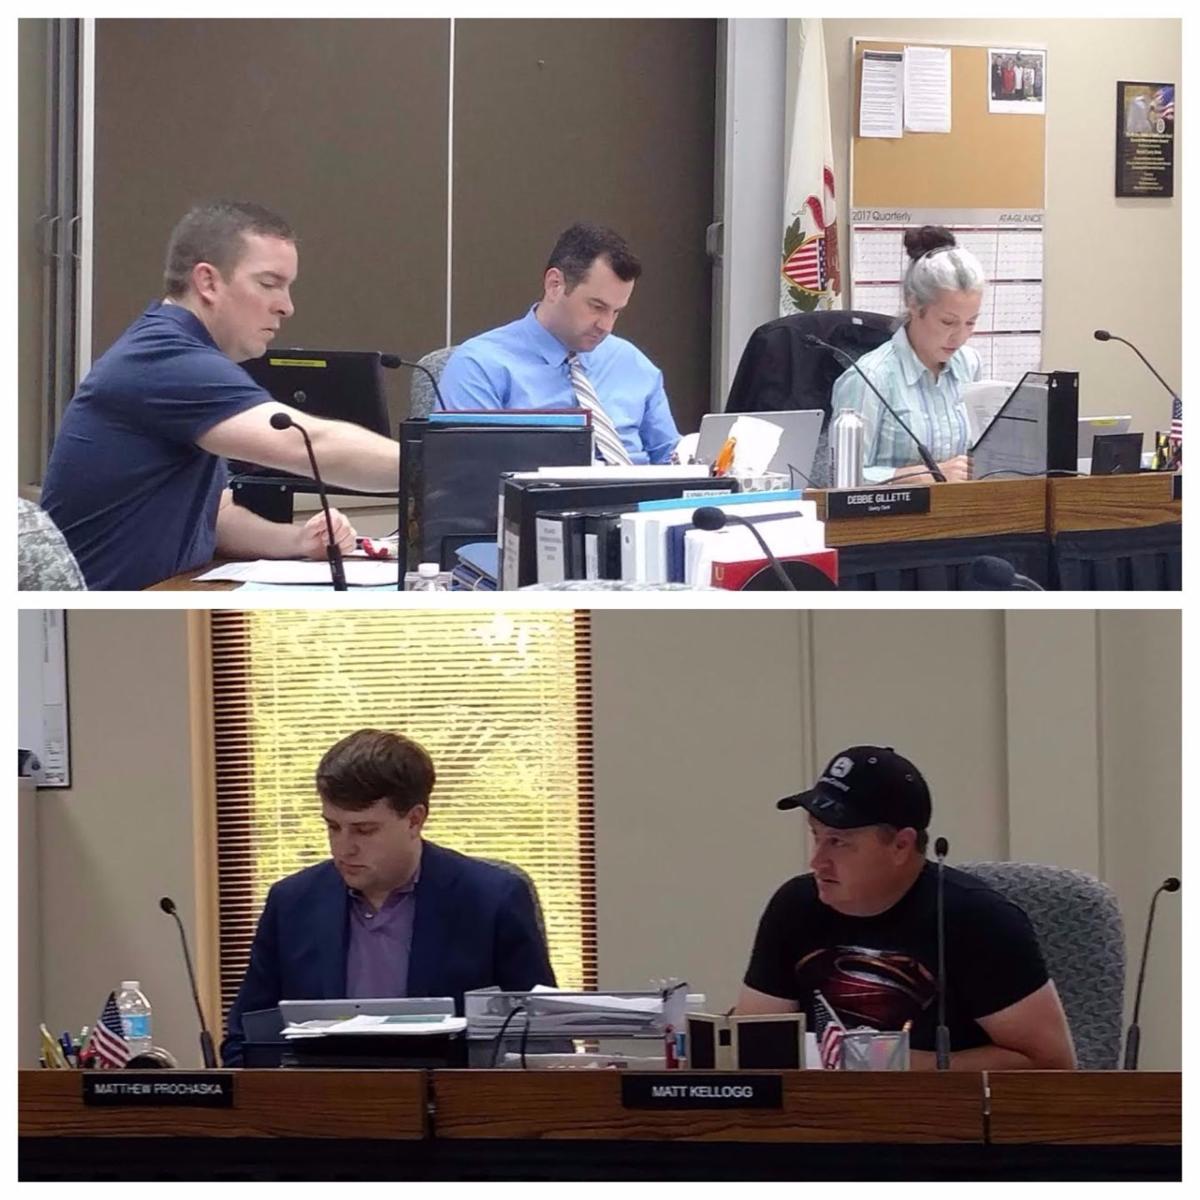 Illinois kendall county oswego - Kendall County Board Economic Development Committee